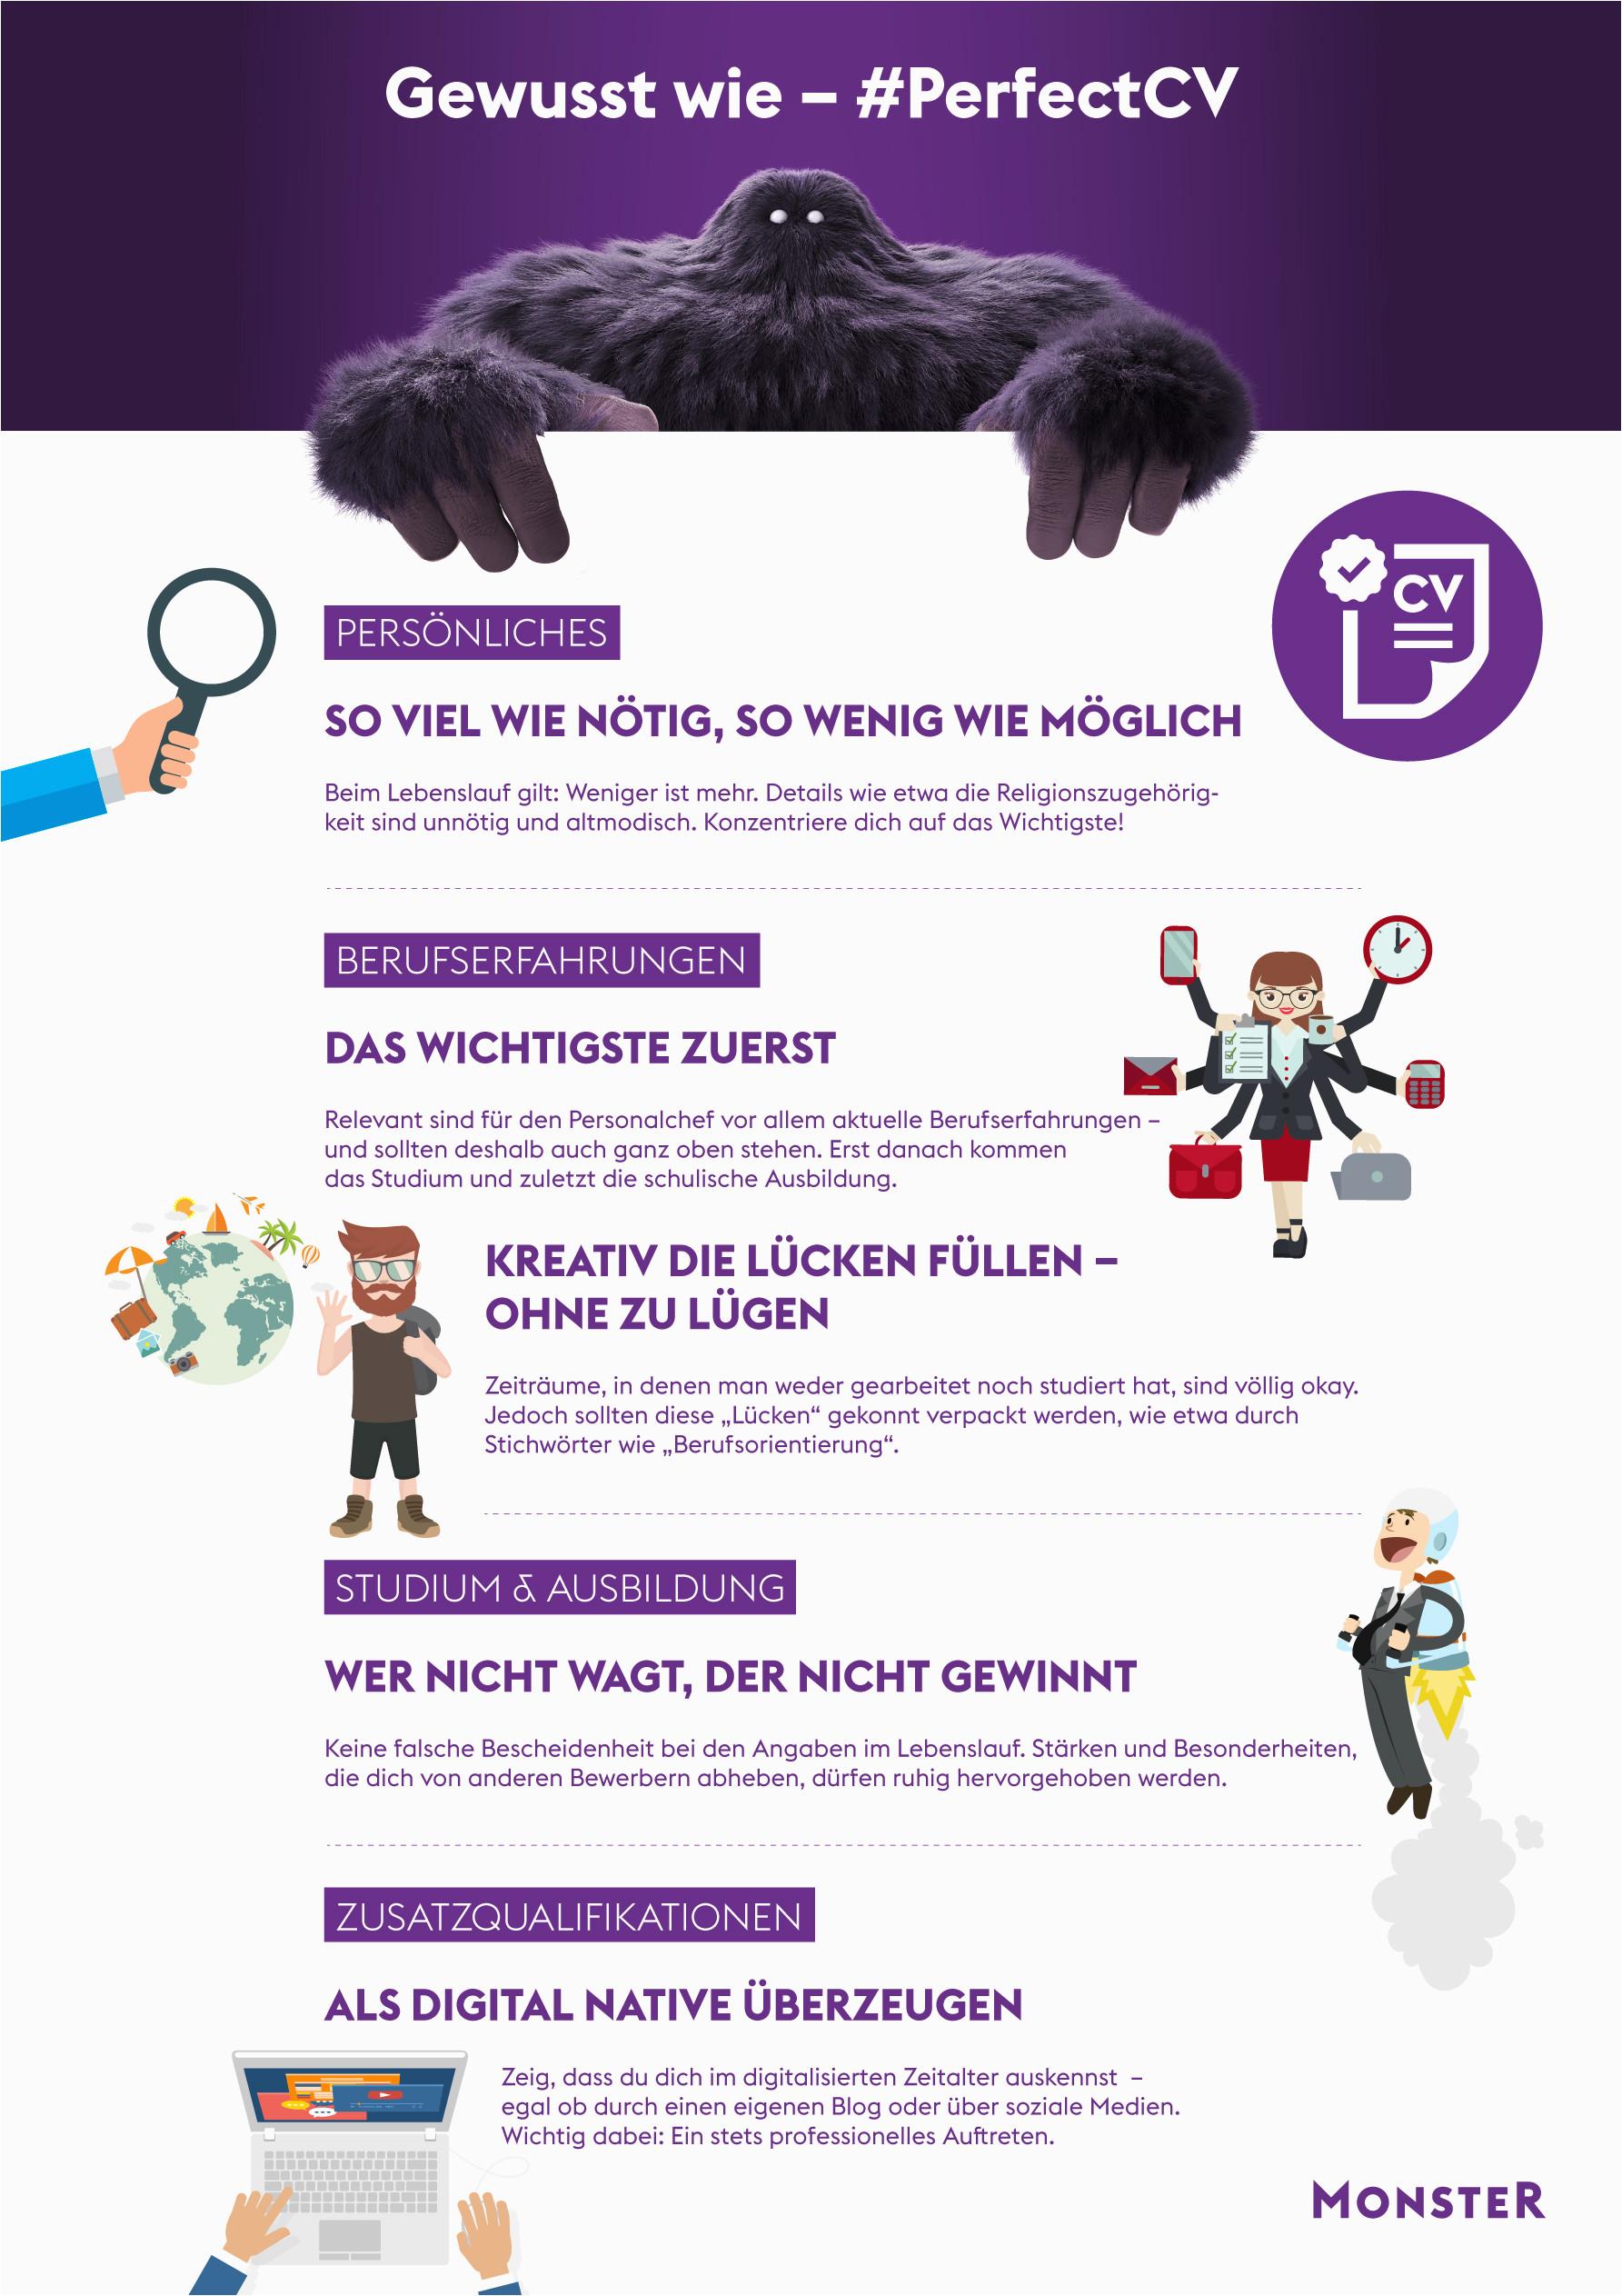 Lebenslauf Englisch Monster Perfekter Cv 15 Tipps Zum Lebenslauf